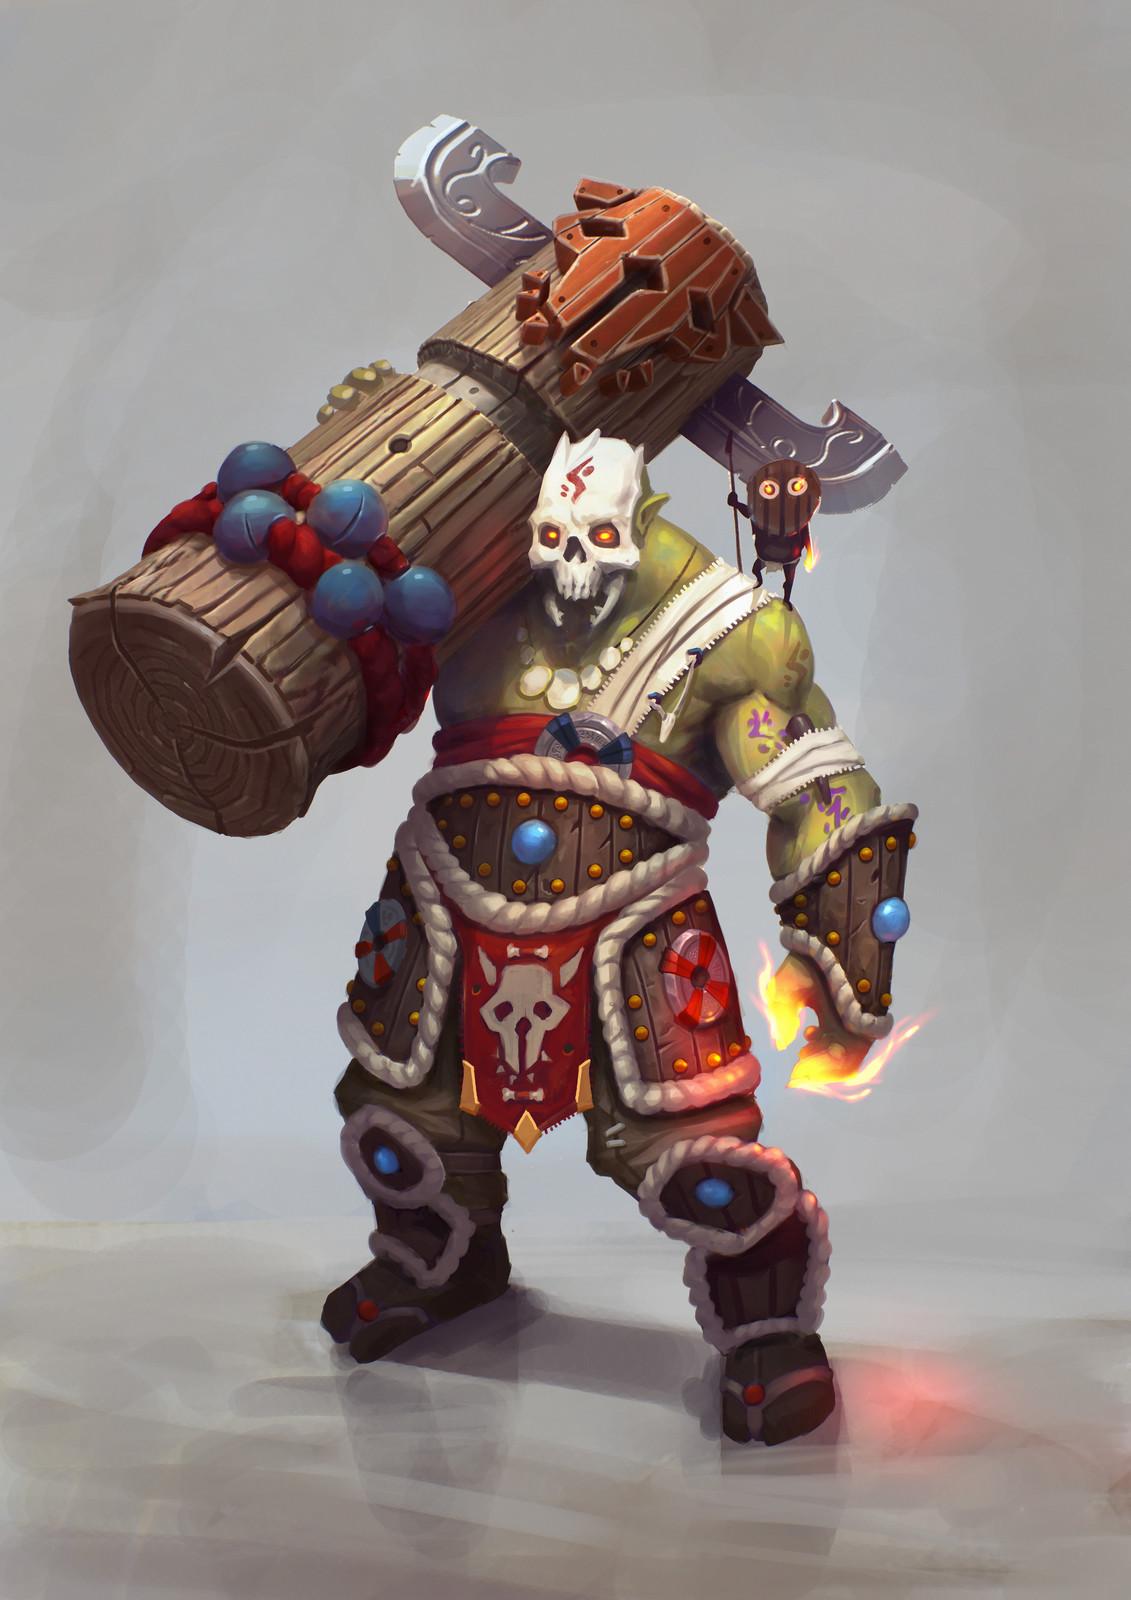 Warcraft reaper - Part 1